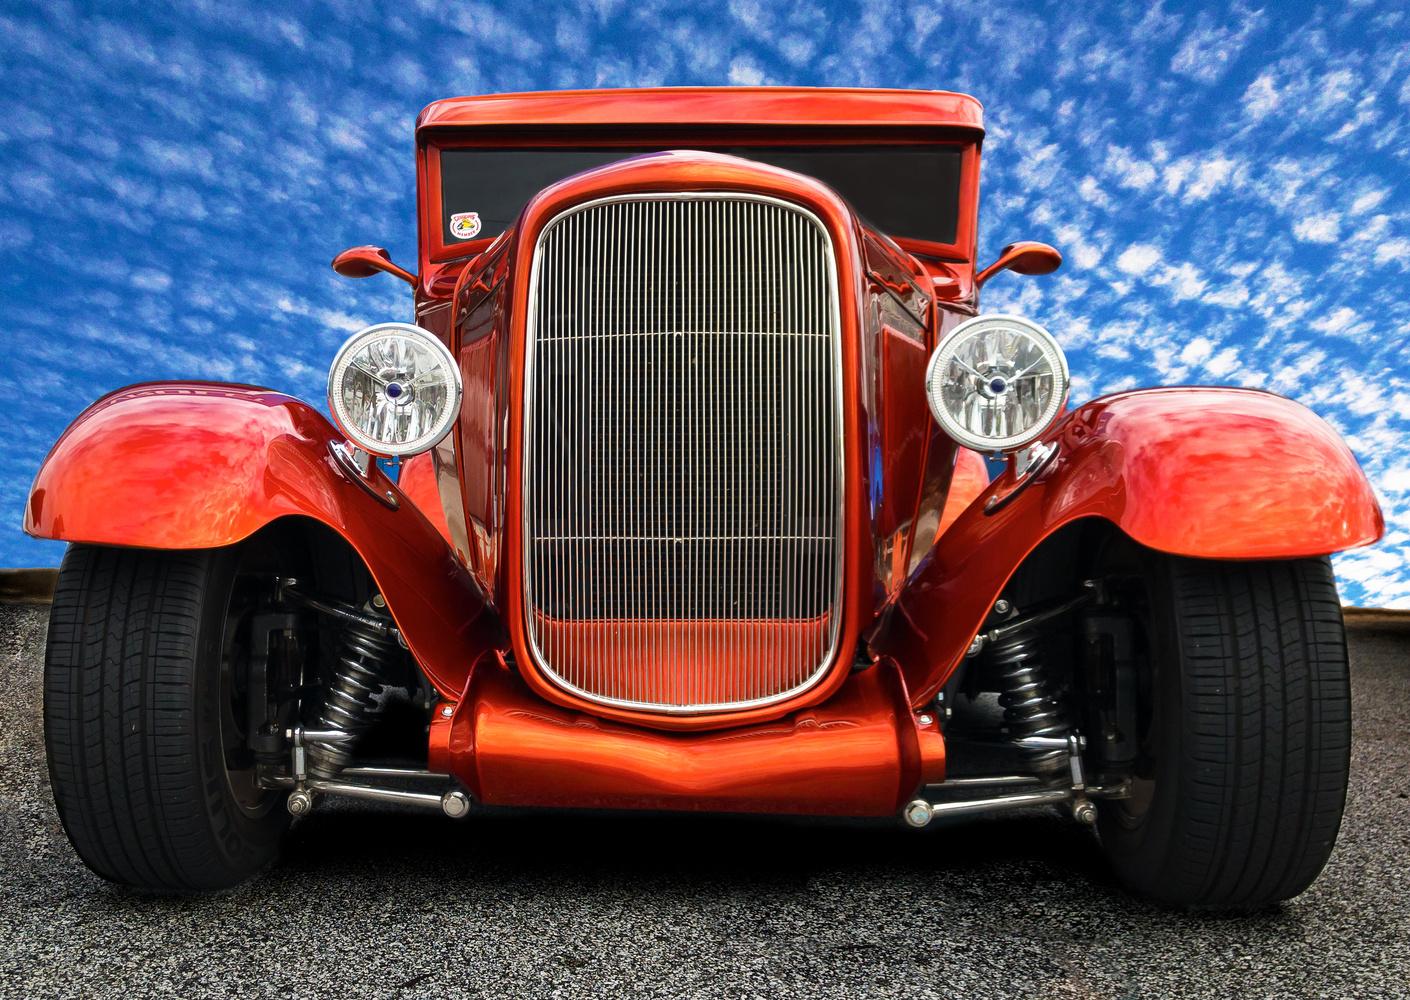 1930 Ford Street Rod by Mark Guinn